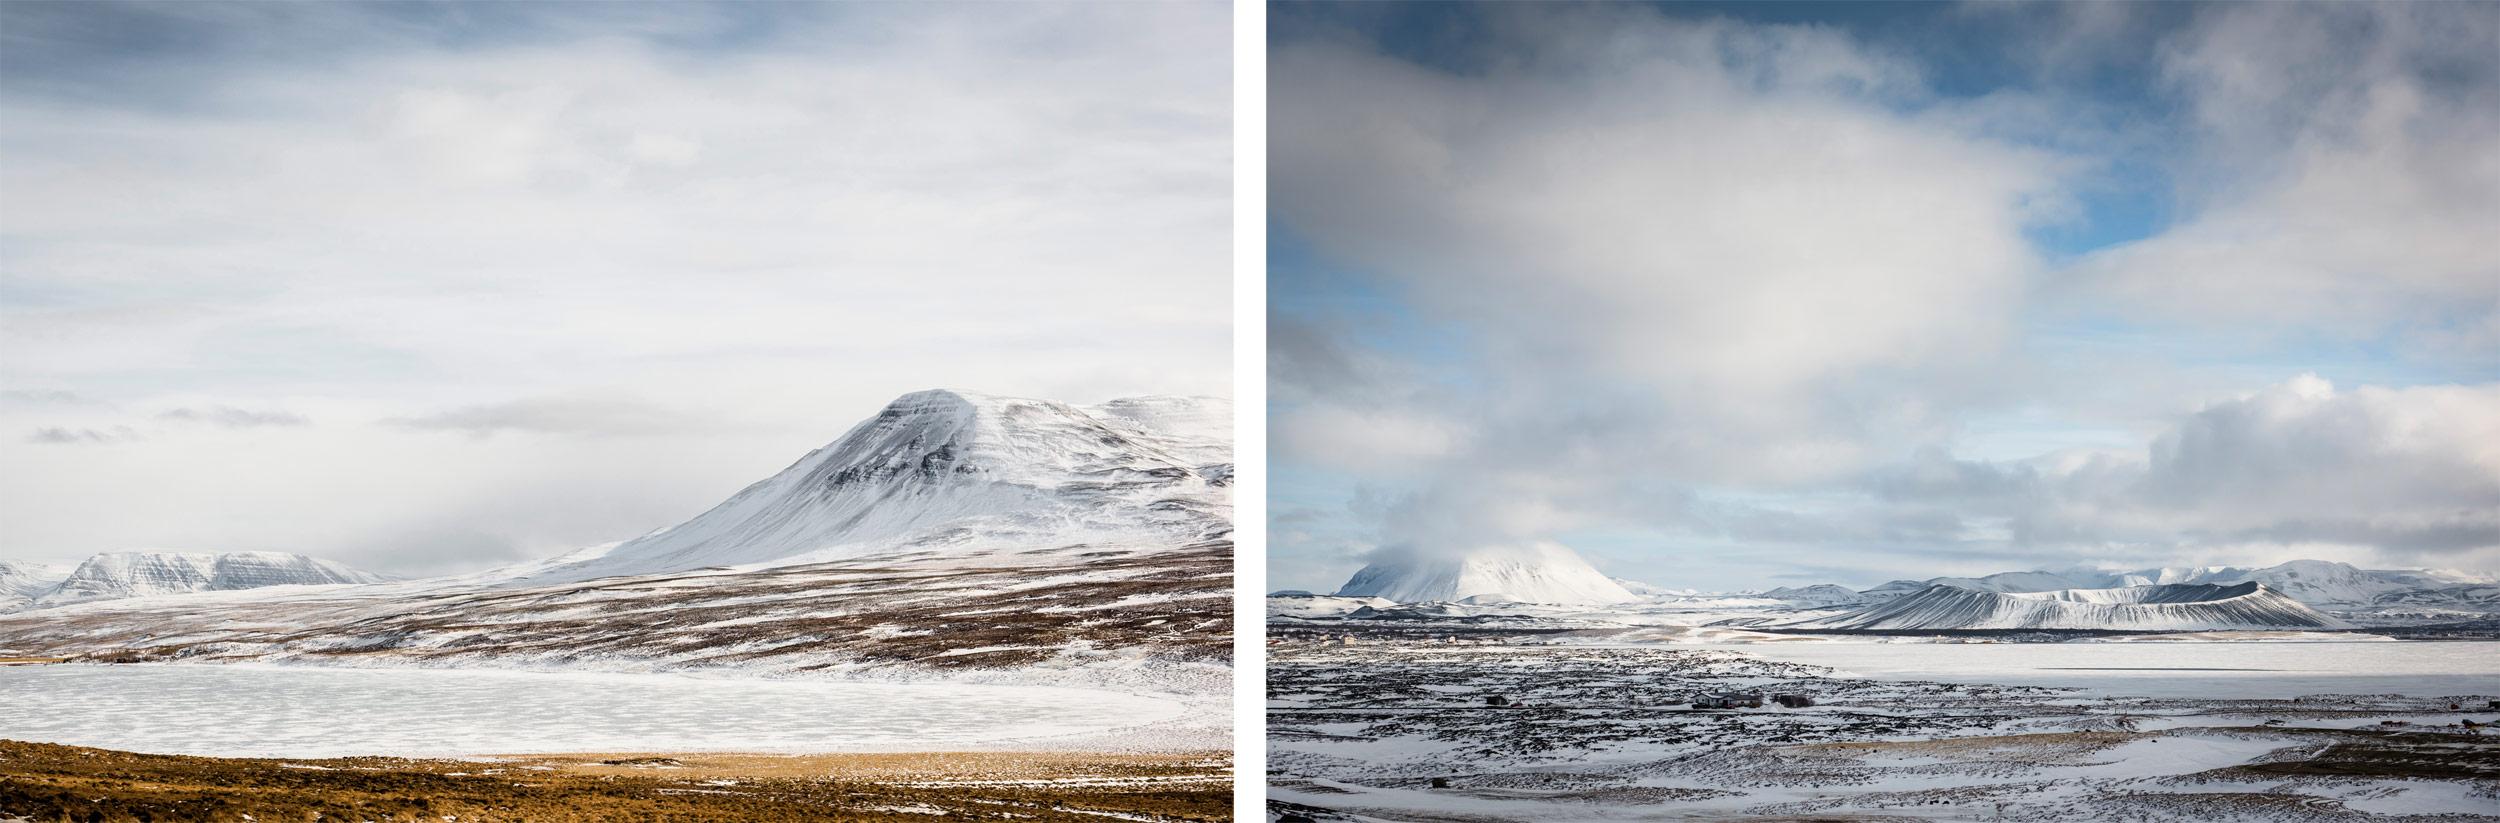 Voyage_Islande_Hiver_Anouk-Ruffieux_02.jpg